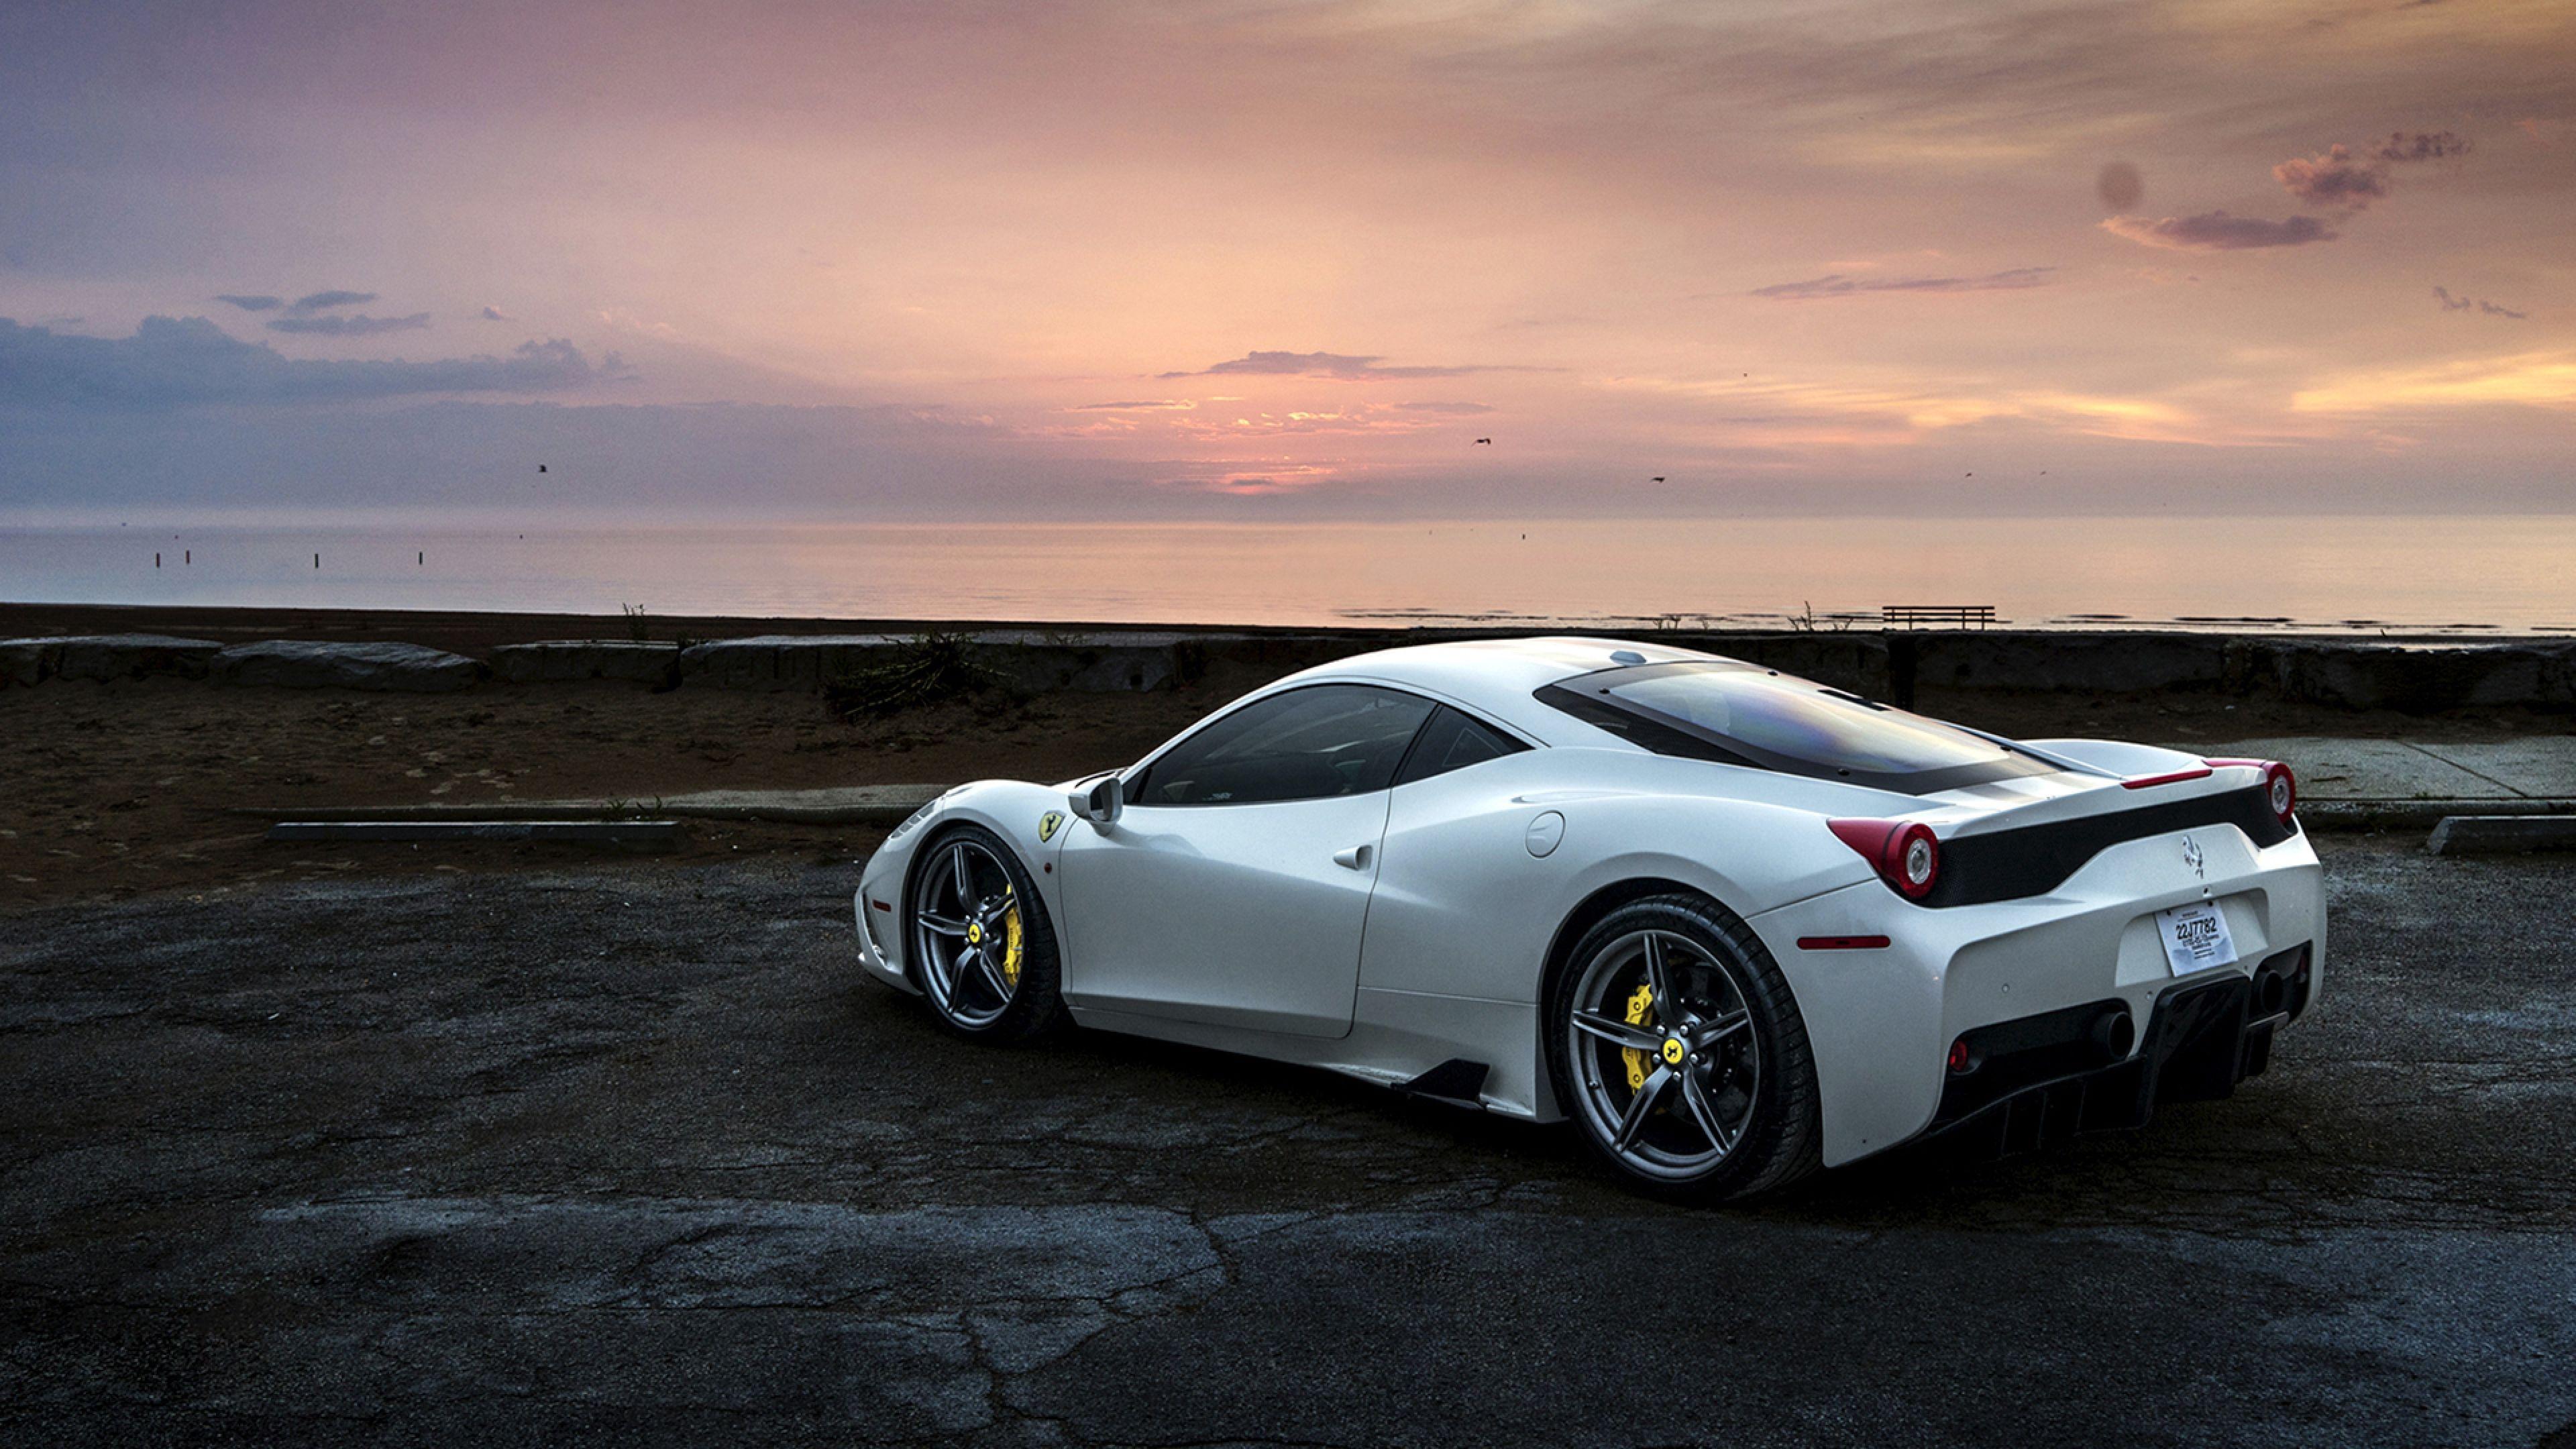 Ferrari Wallpaper 4K Phone